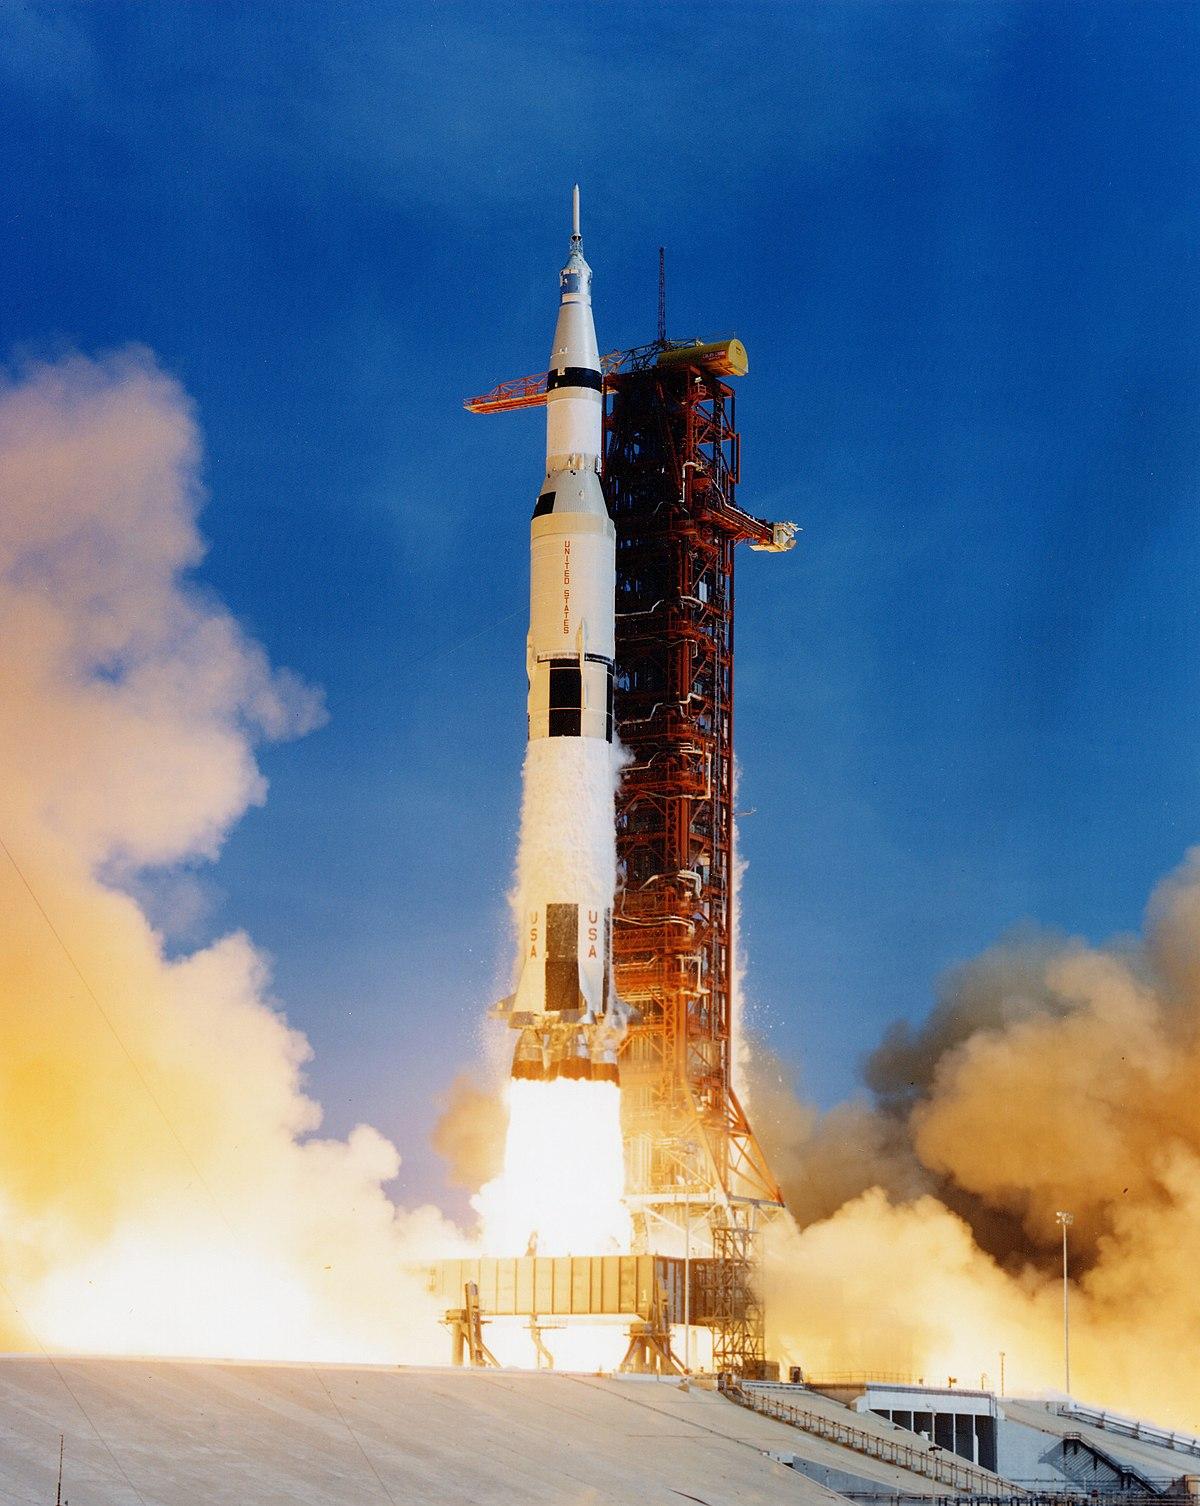 Fusée (astronautique) — Wikipédia